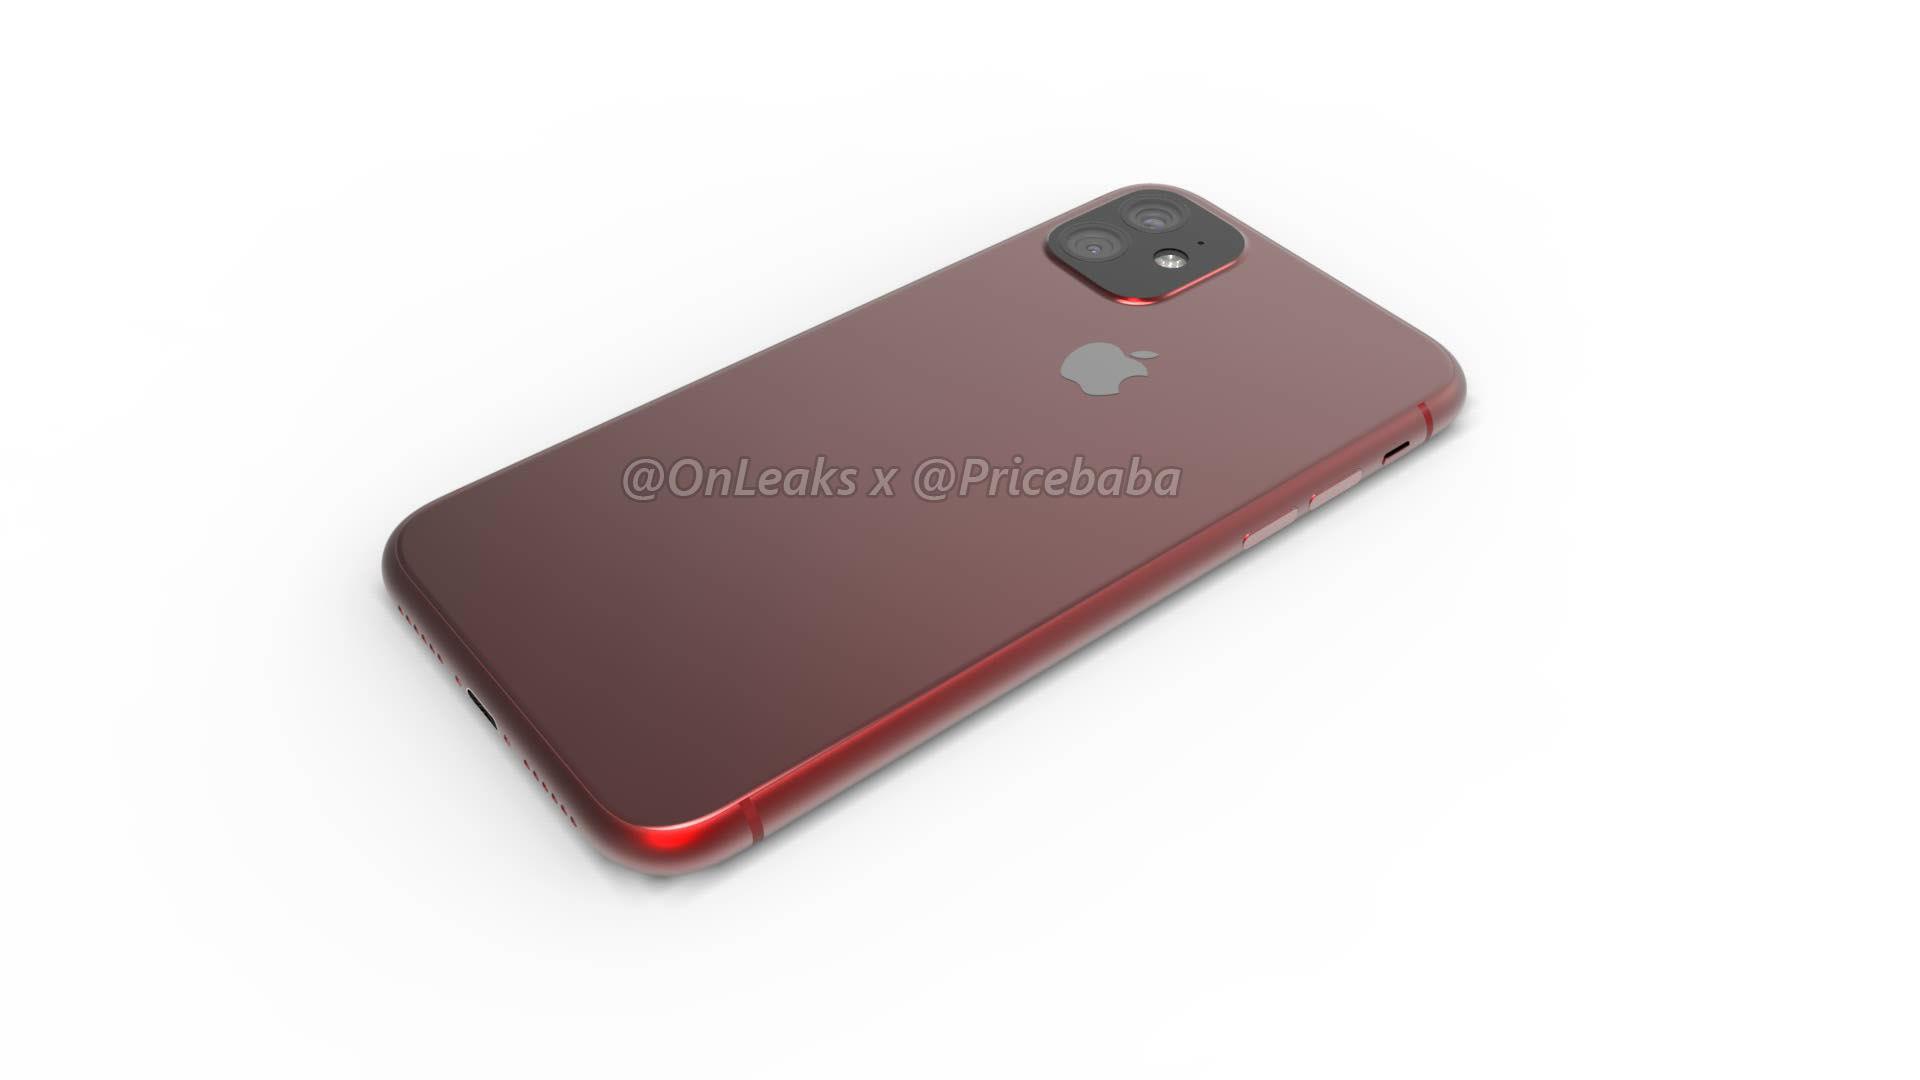 Exclusive: iPhone XR 2019 Renders And 360-Degree Video - Pricebaba